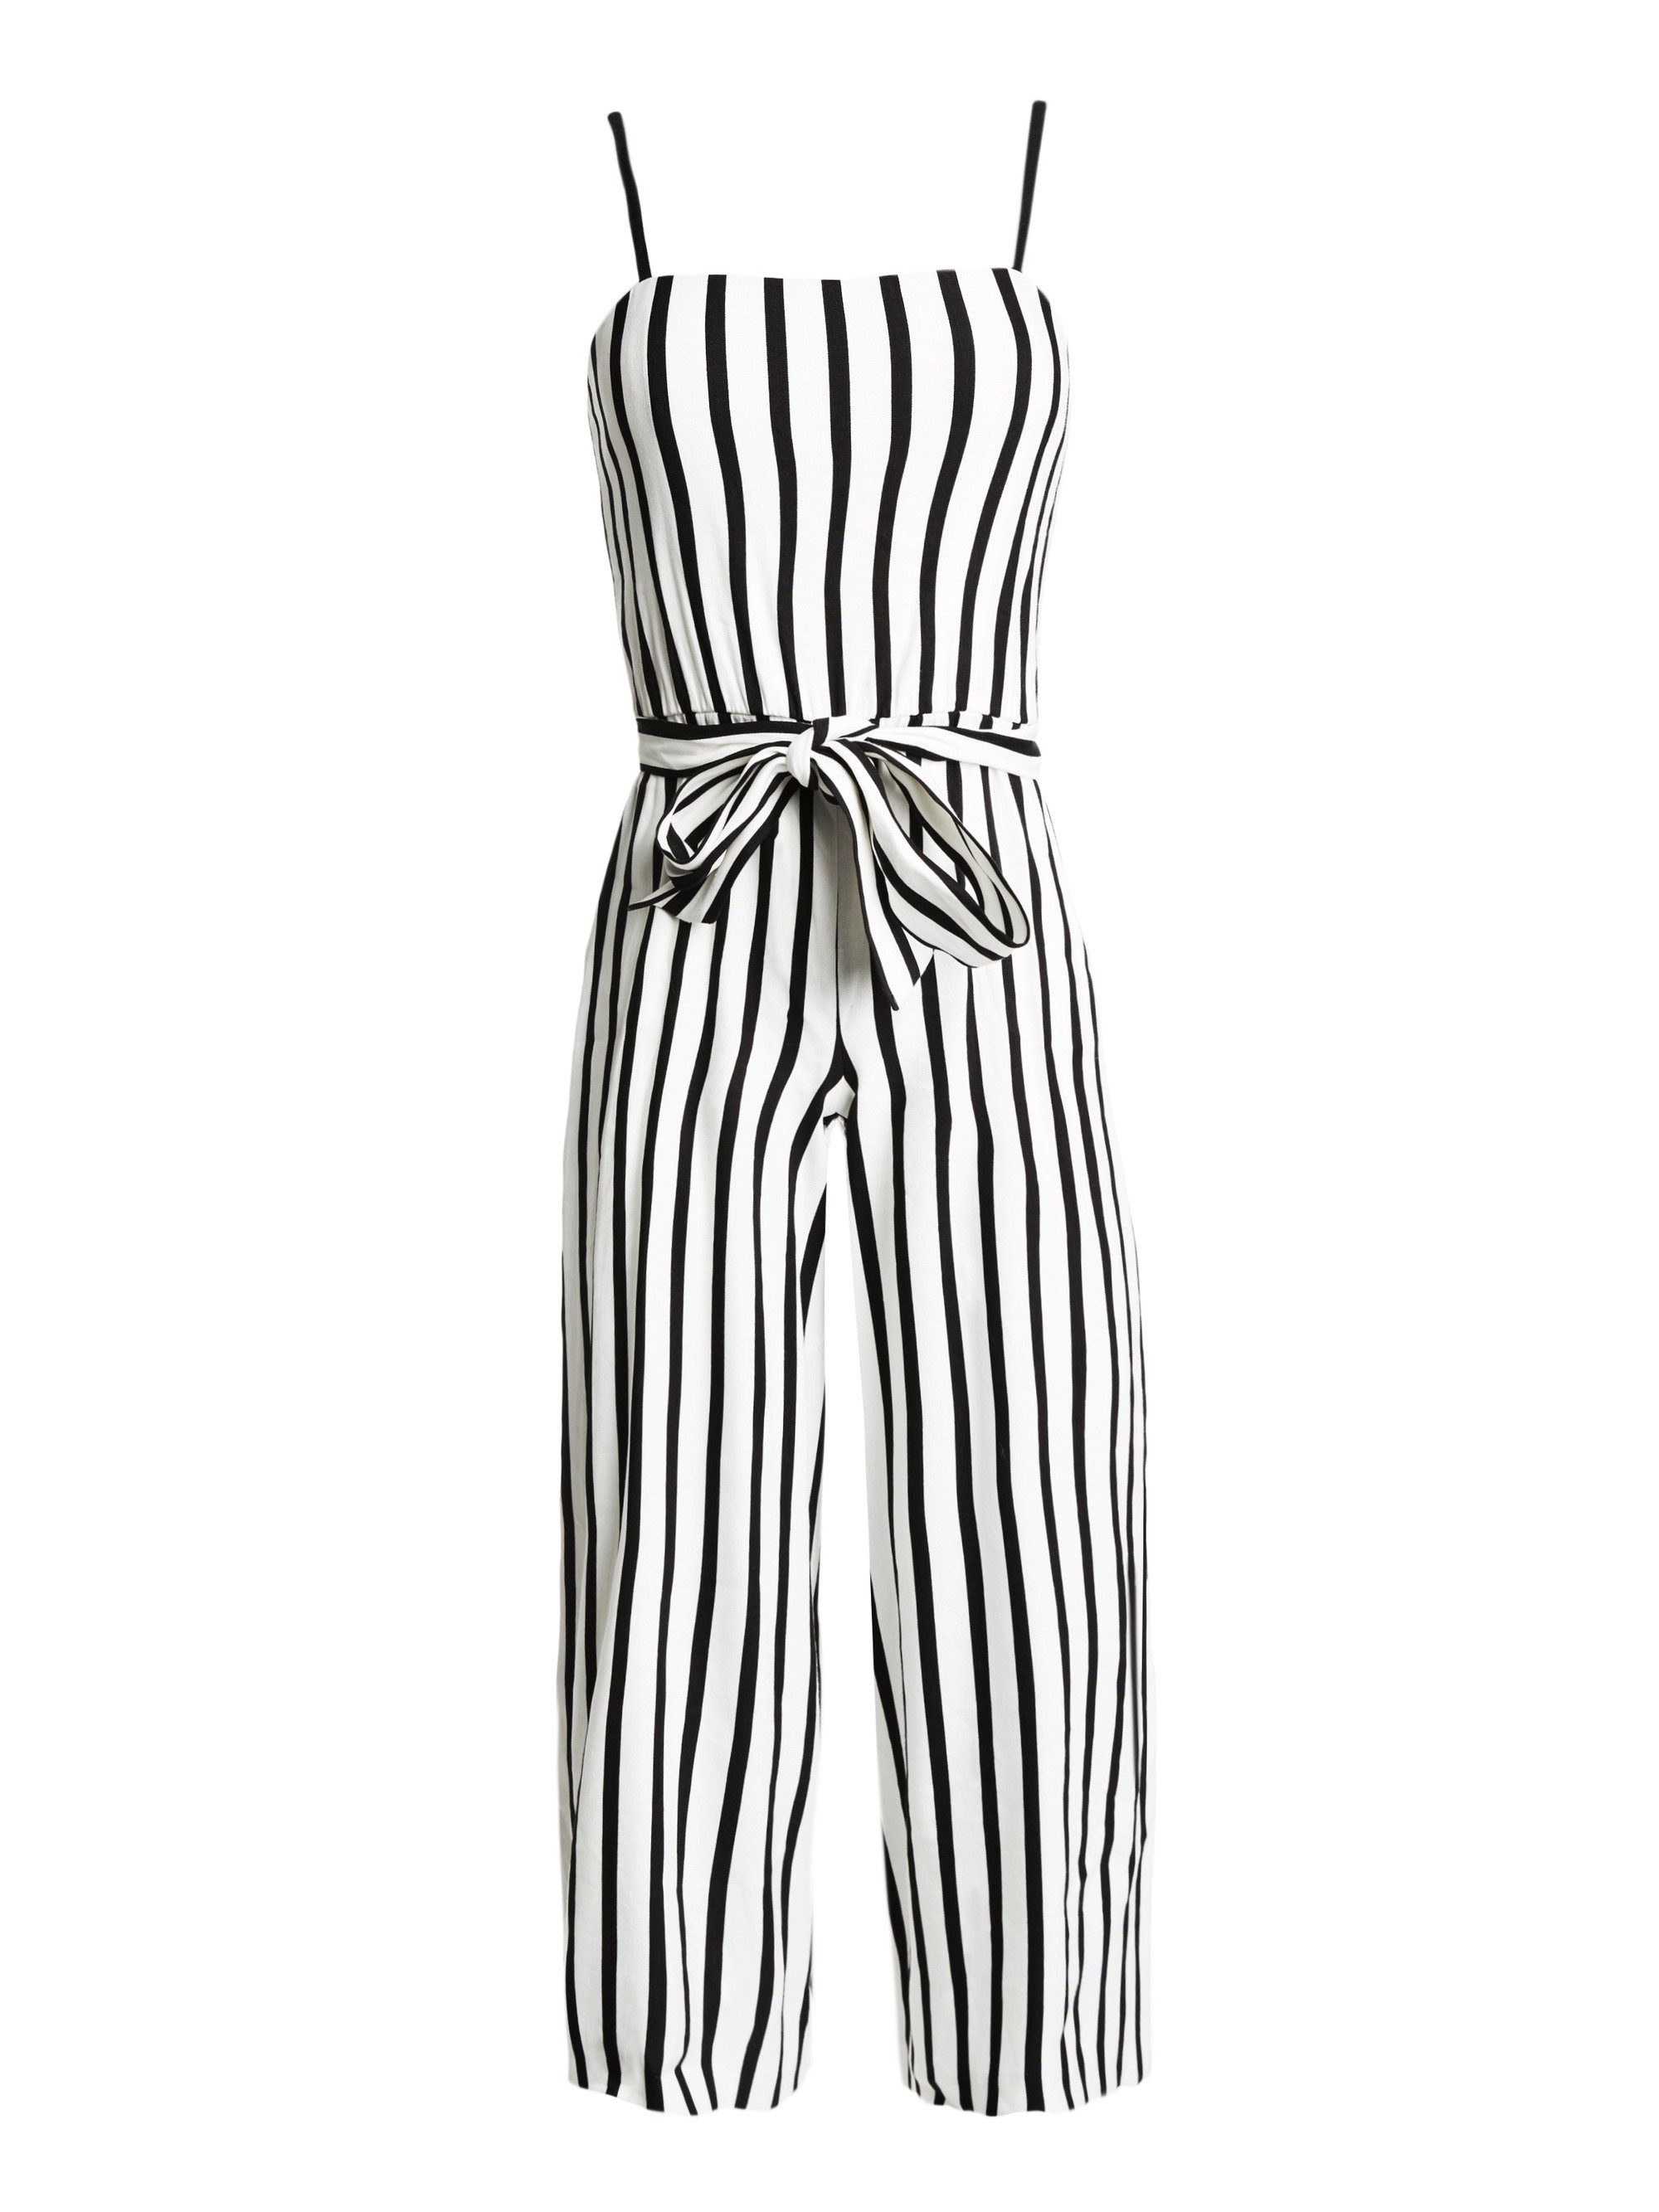 7b80b951174 Alice + Olivia Lucie Spaghetti Stripe Gaucho Jumpsuit - 12 ...